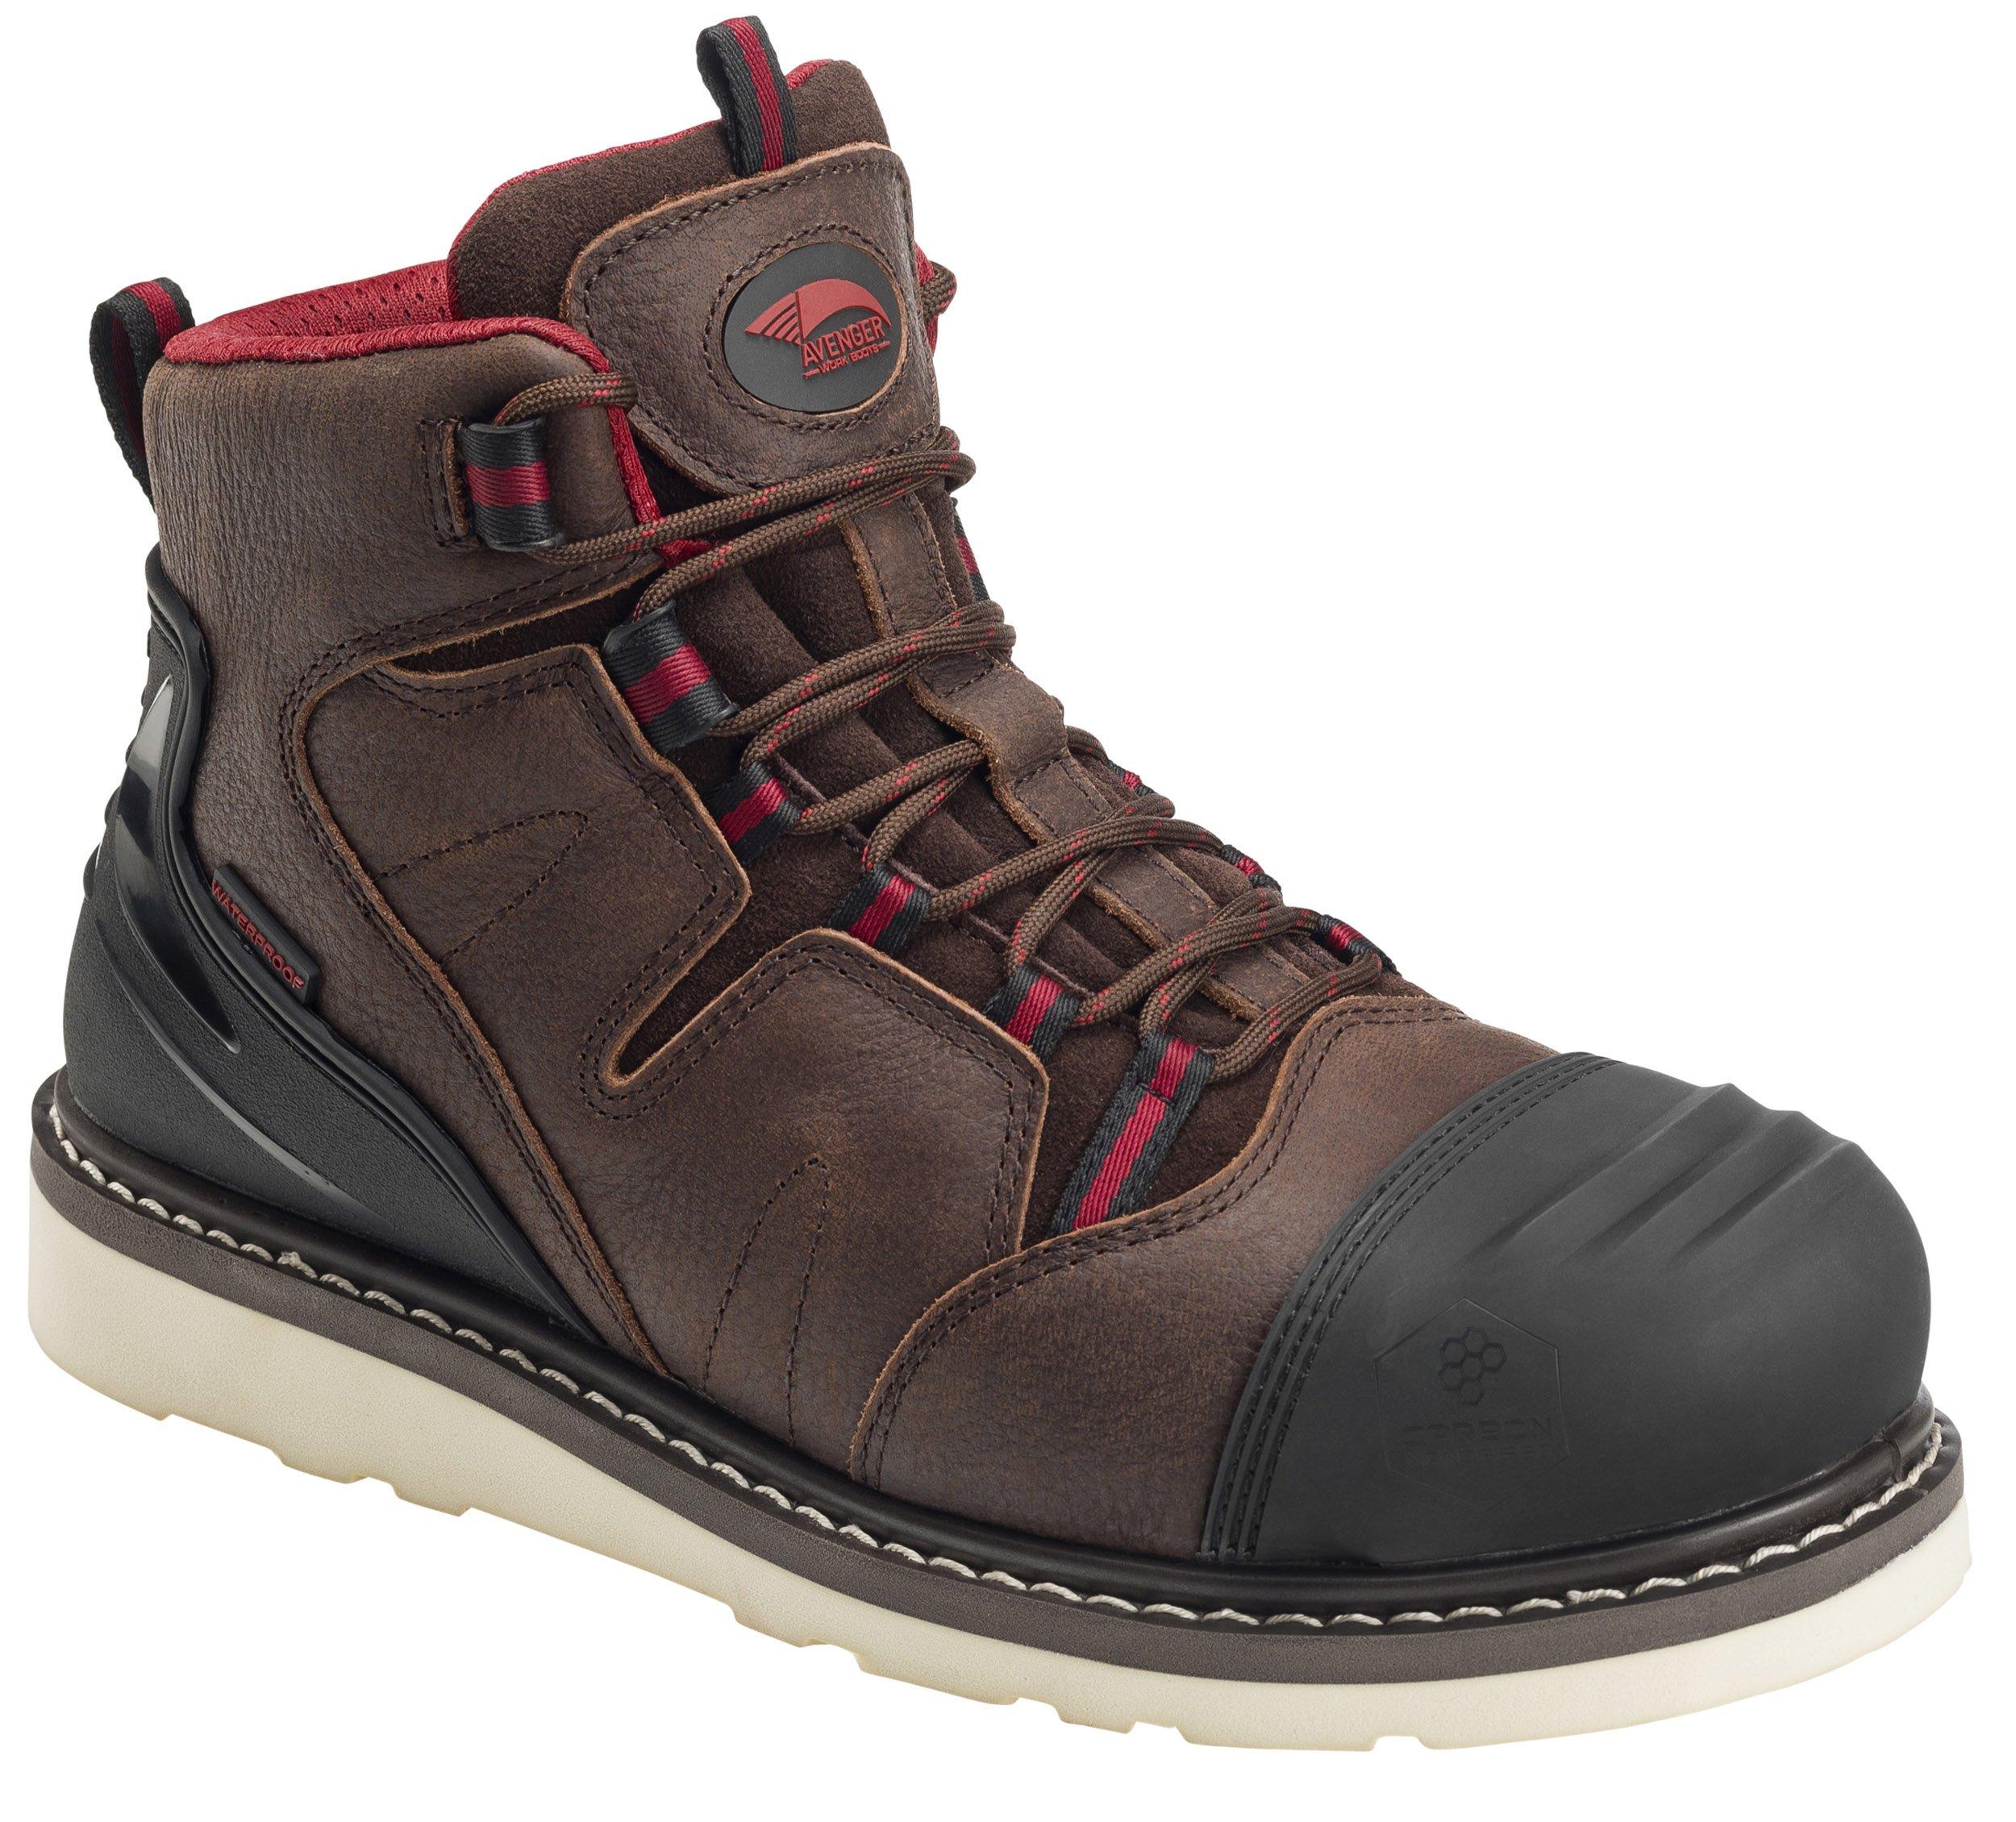 "Avenger Men's 6"" Waterproof Work Boot Composite Toe - A7506"